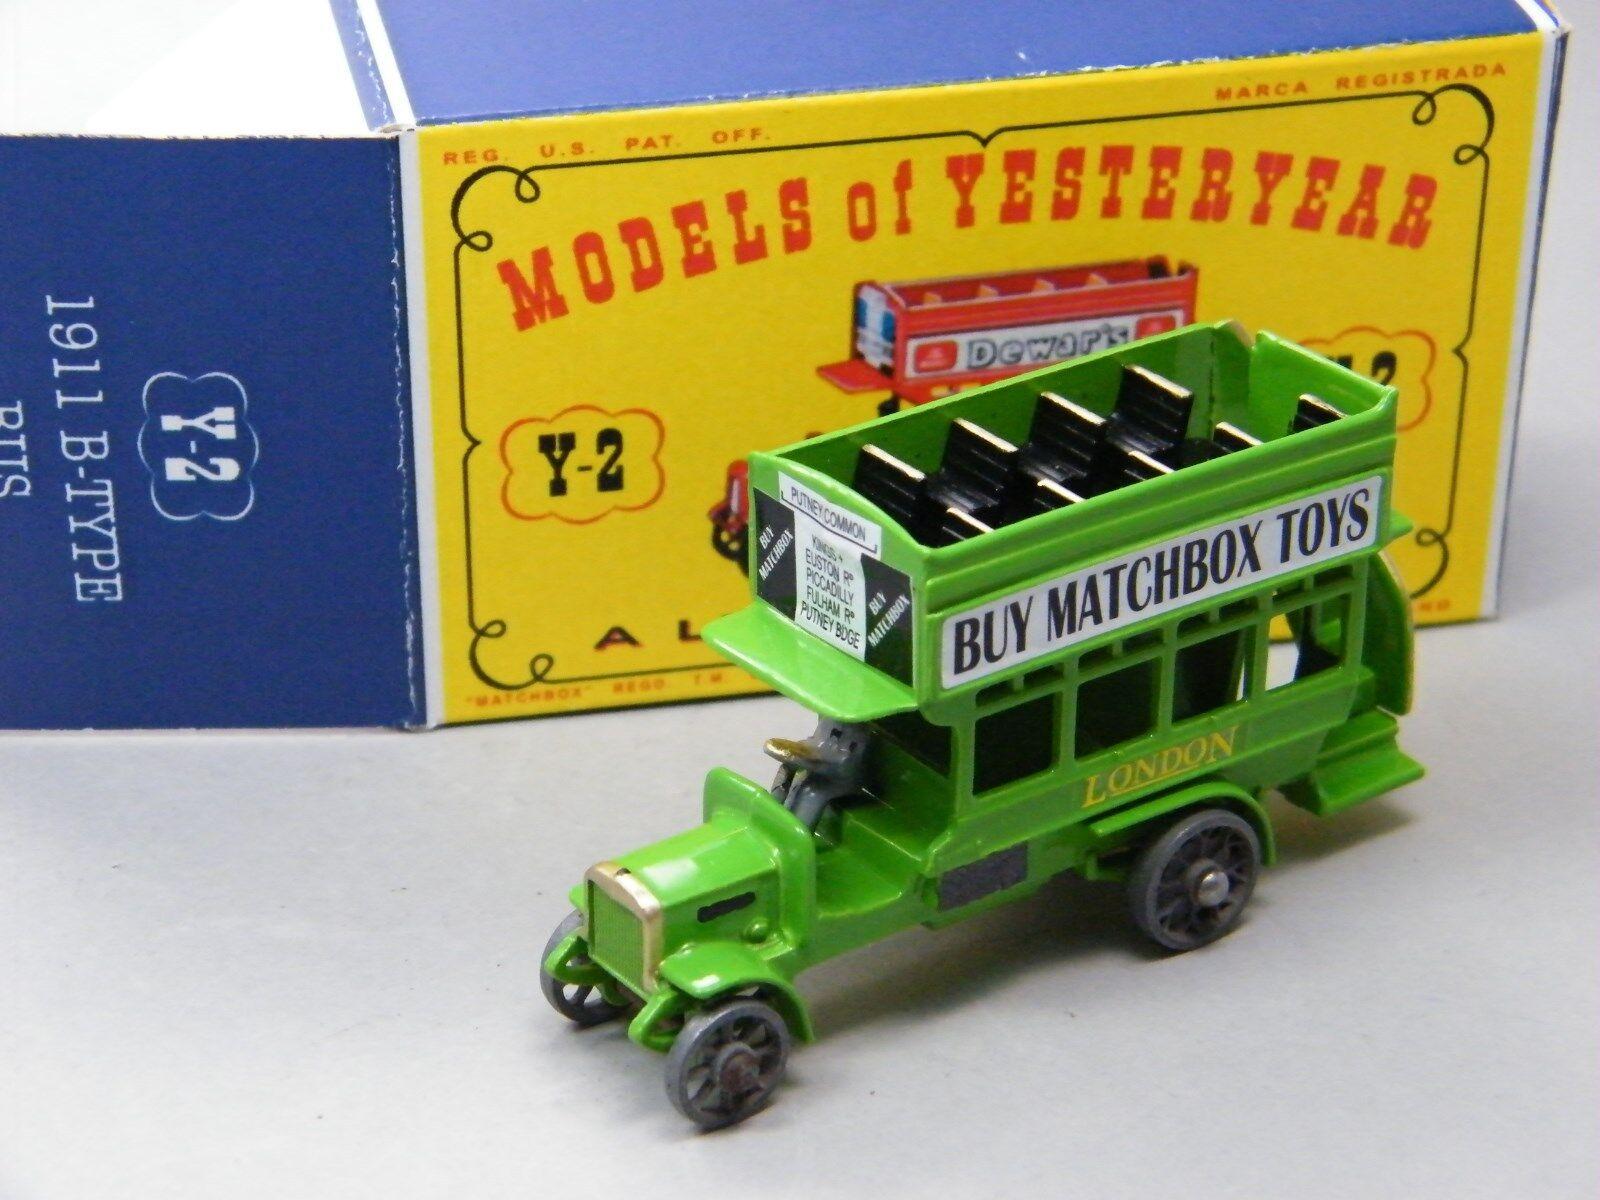 Matchbox Yesteryear Y-2 London Bus hellgreen  Buy Matchbox Toys  Clubtreffen DBox